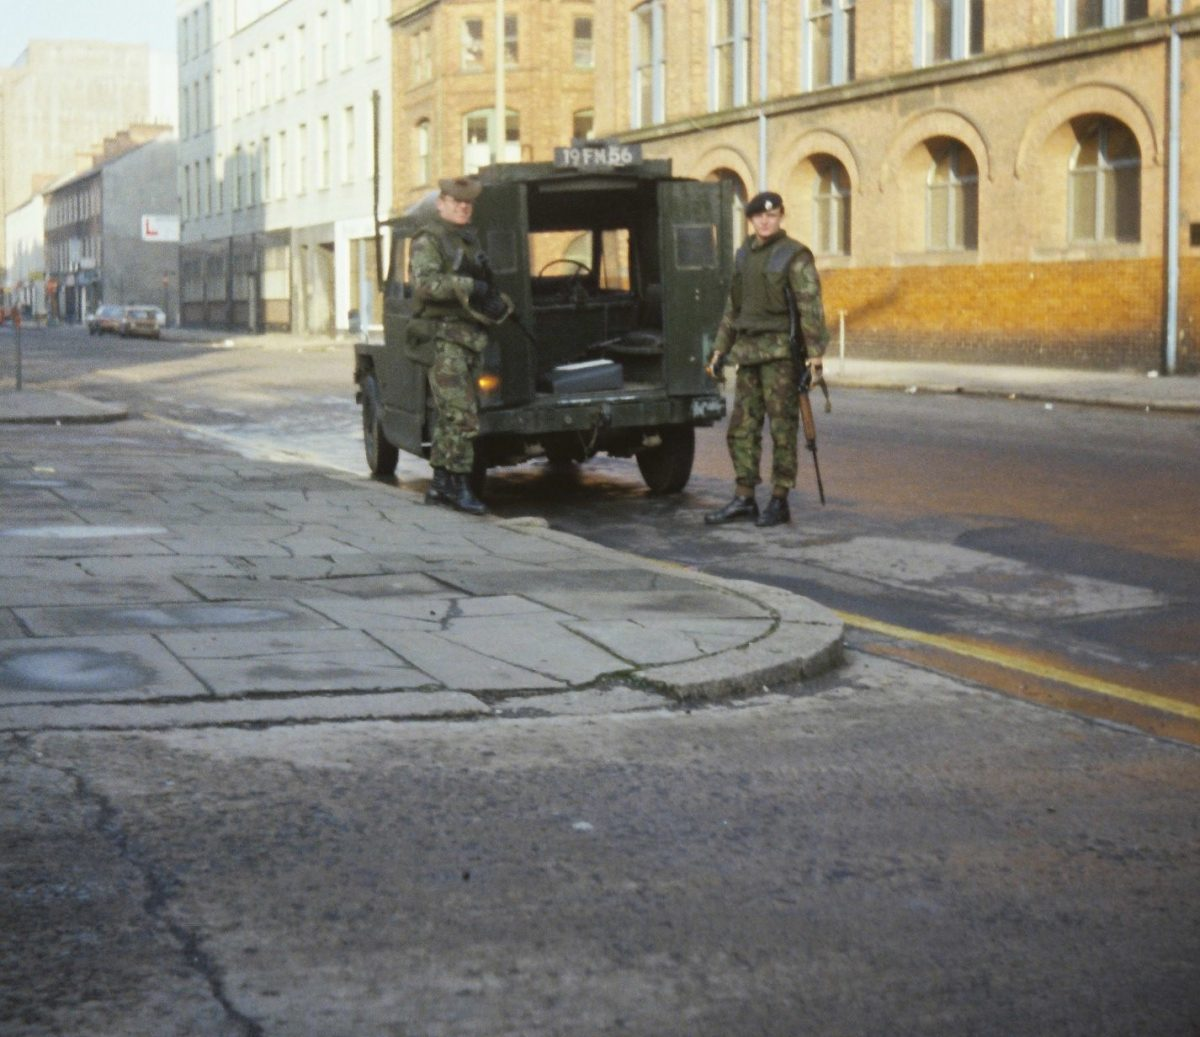 the-Gordons-on-Patrol-in-Linenhall-Street-Belfast-19778-1200x1037.jpg